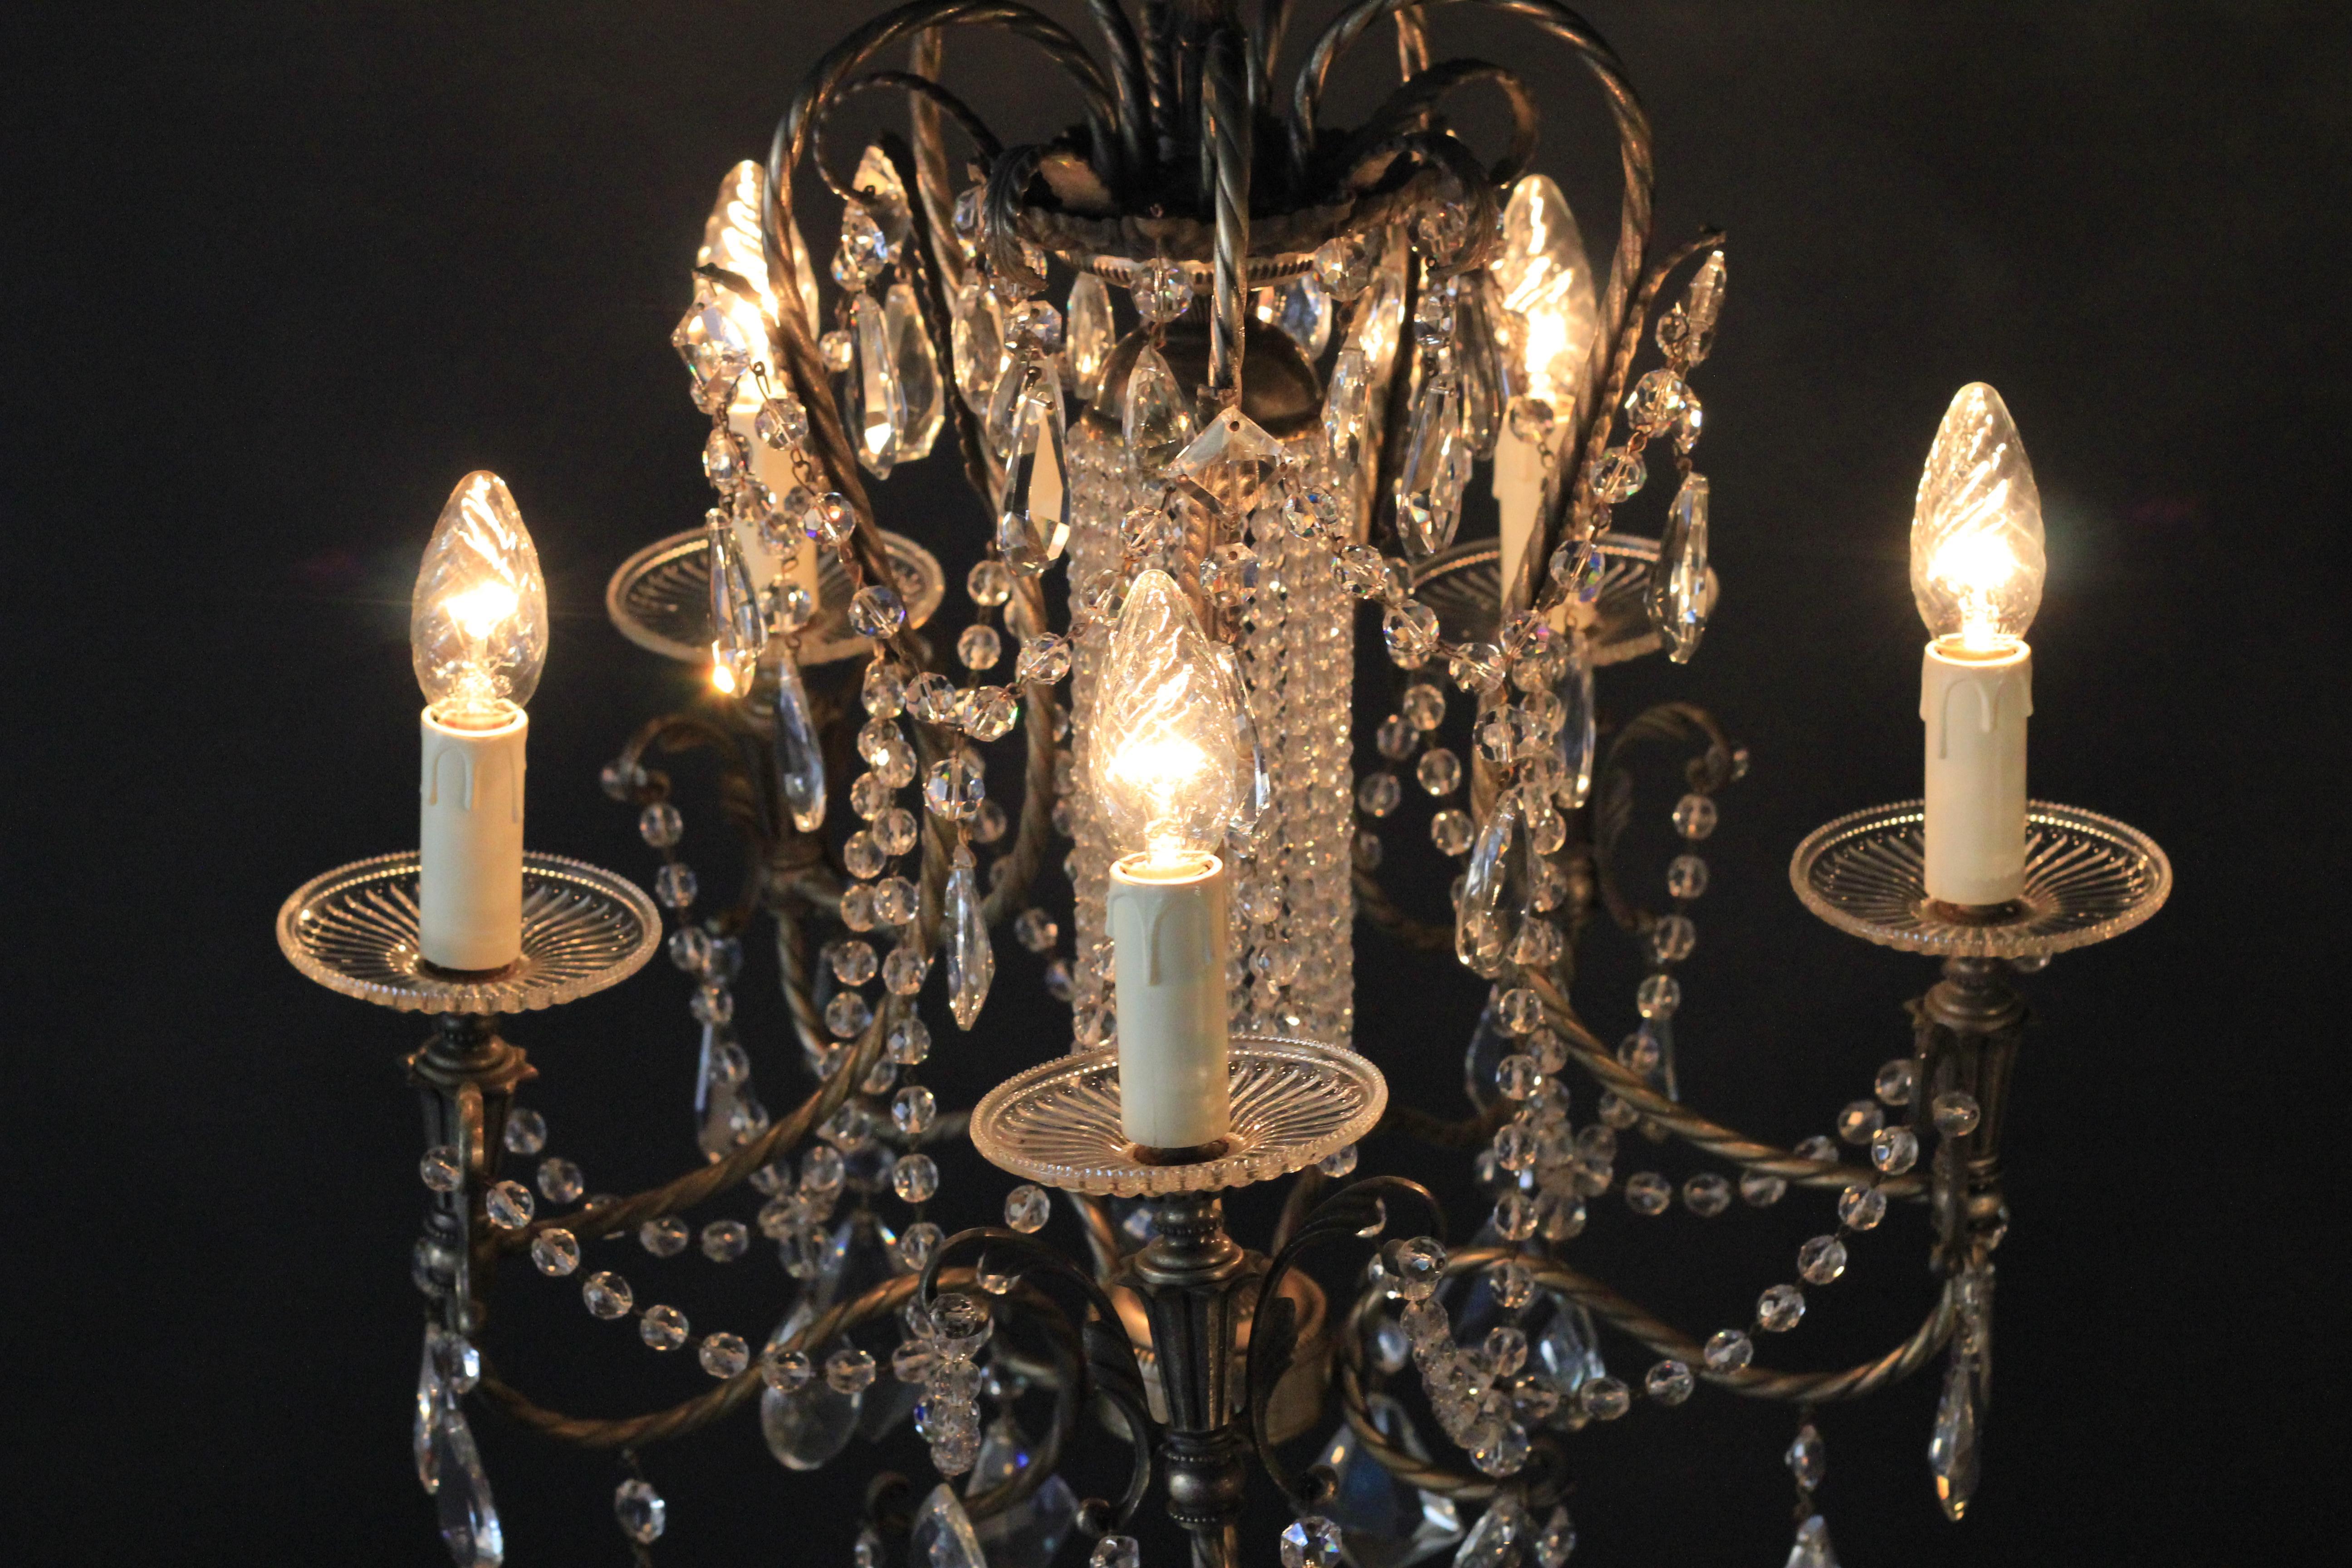 Kronleuchter Kristall Silber ~ Lampe kristall design kronleuchter la ster plafonnier messing